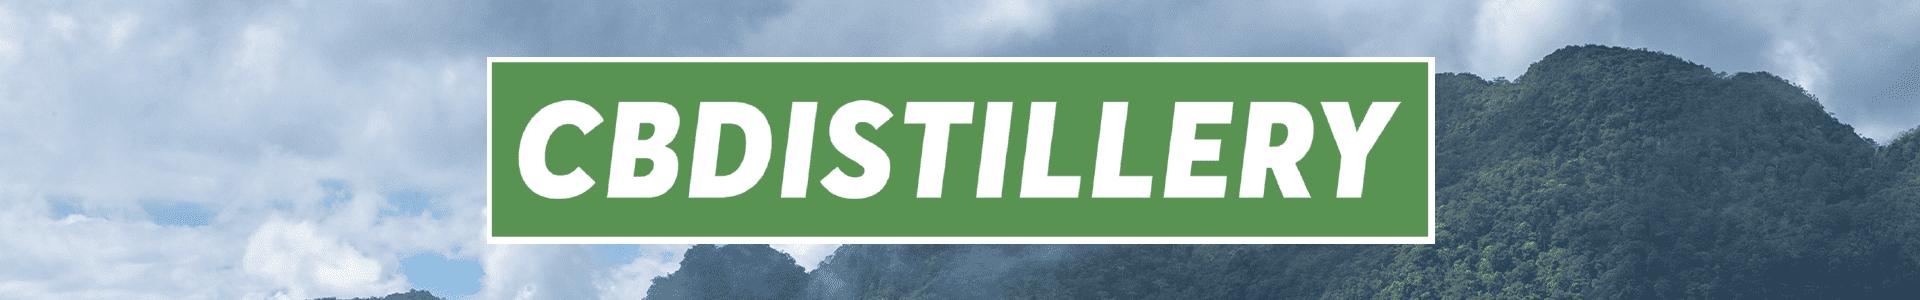 cbdistillery Products Banner logo